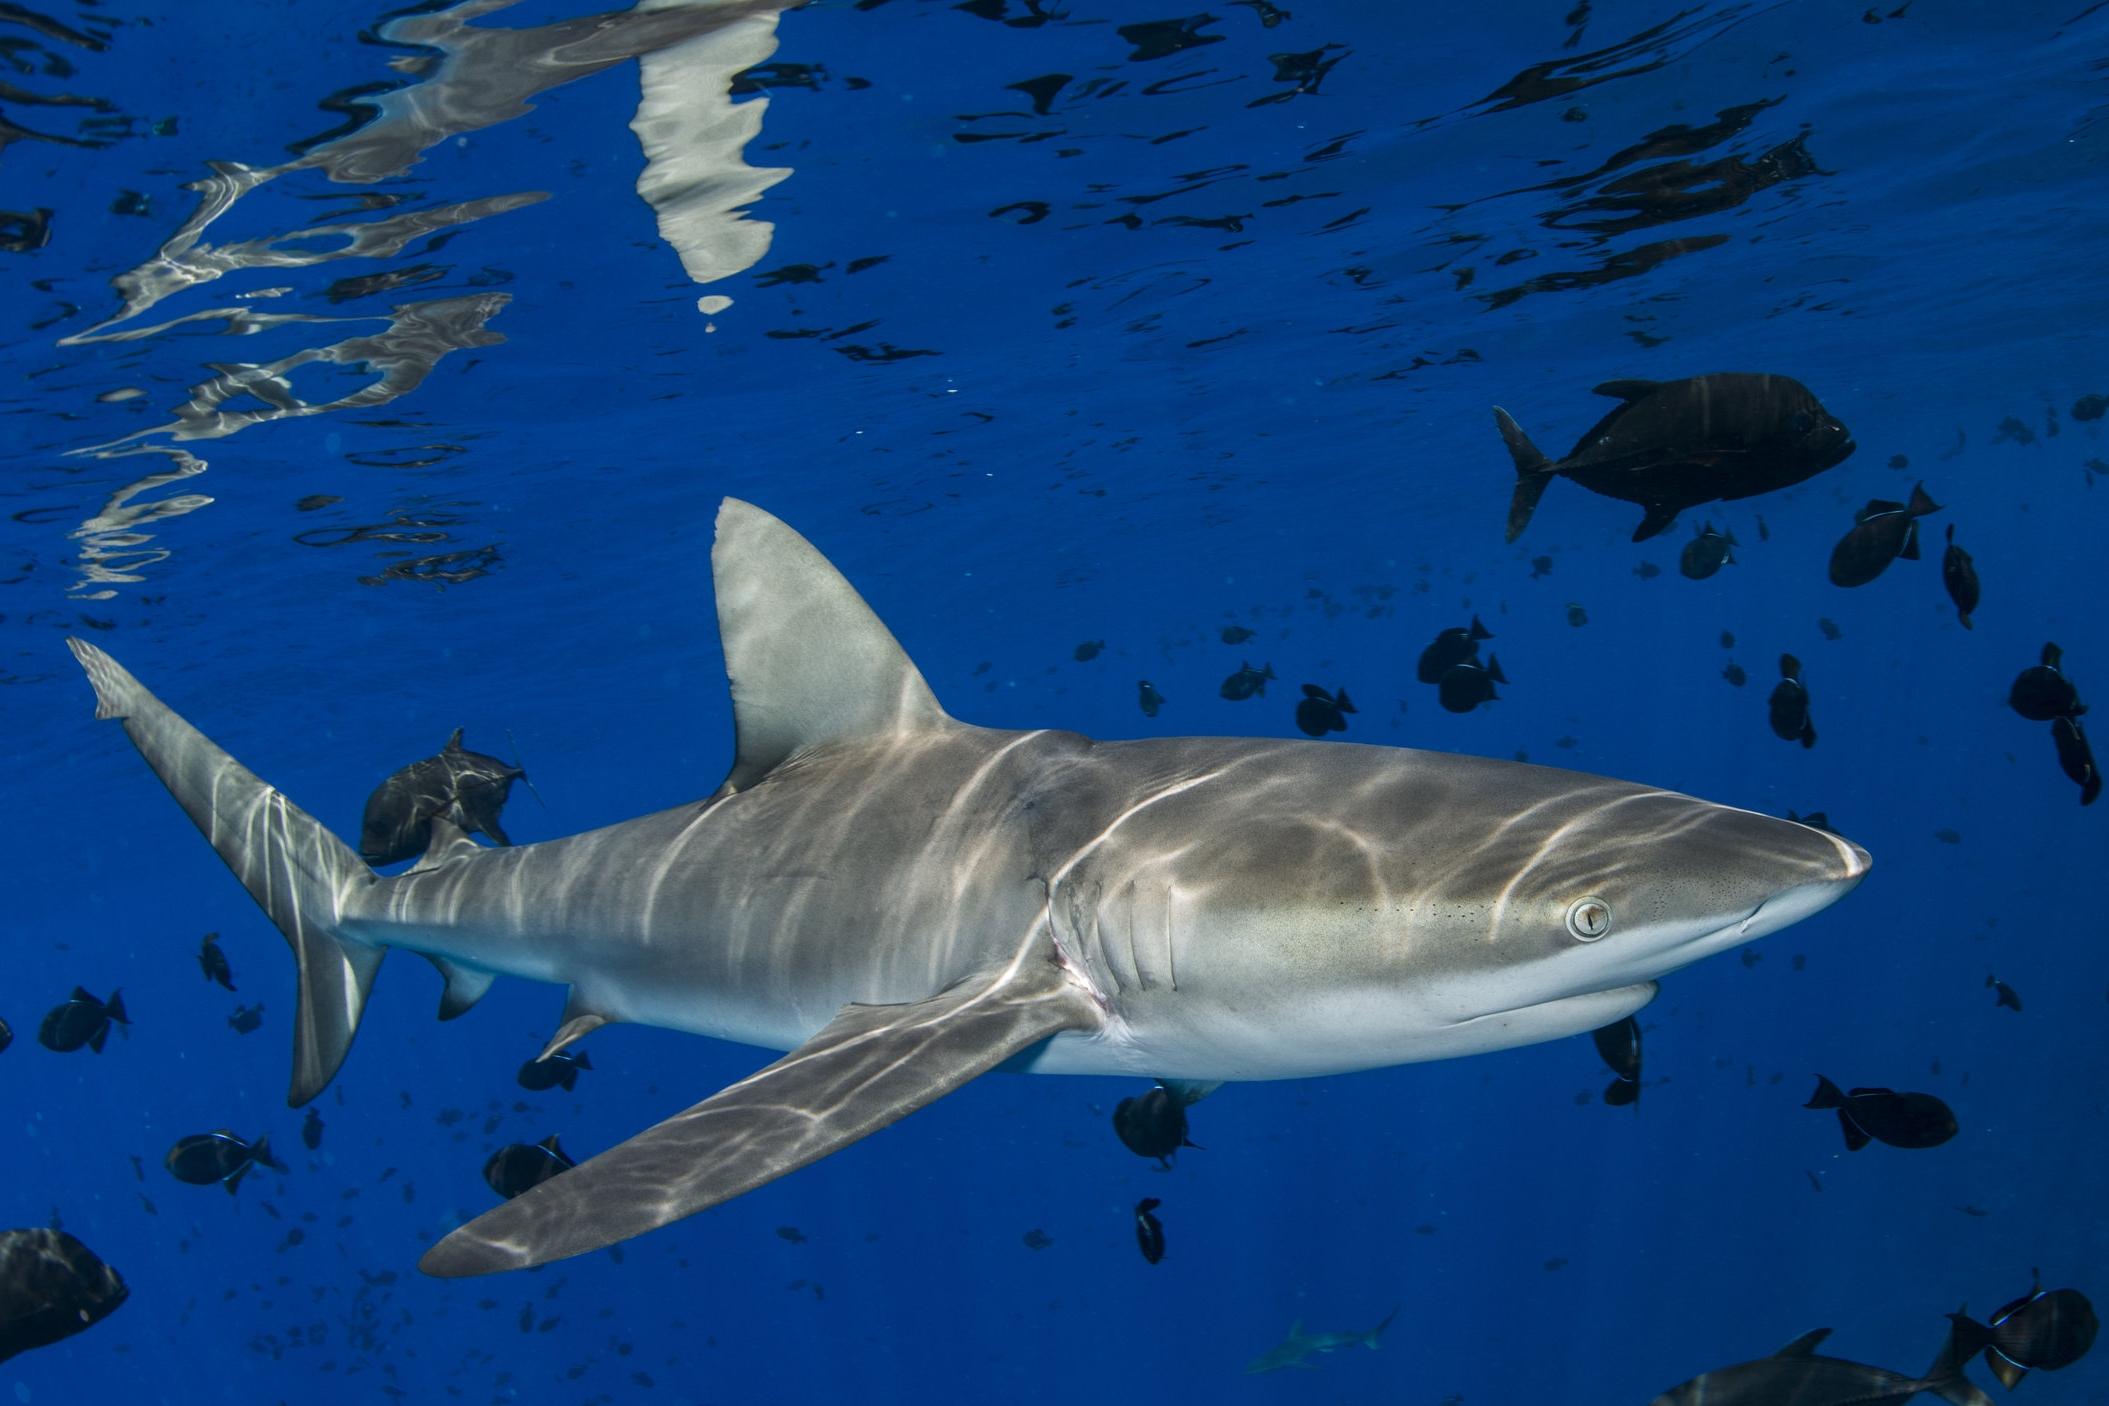 Galapagos shark, blackfish, Ascension island redit: ellen cuylaerts / coral reef image bank